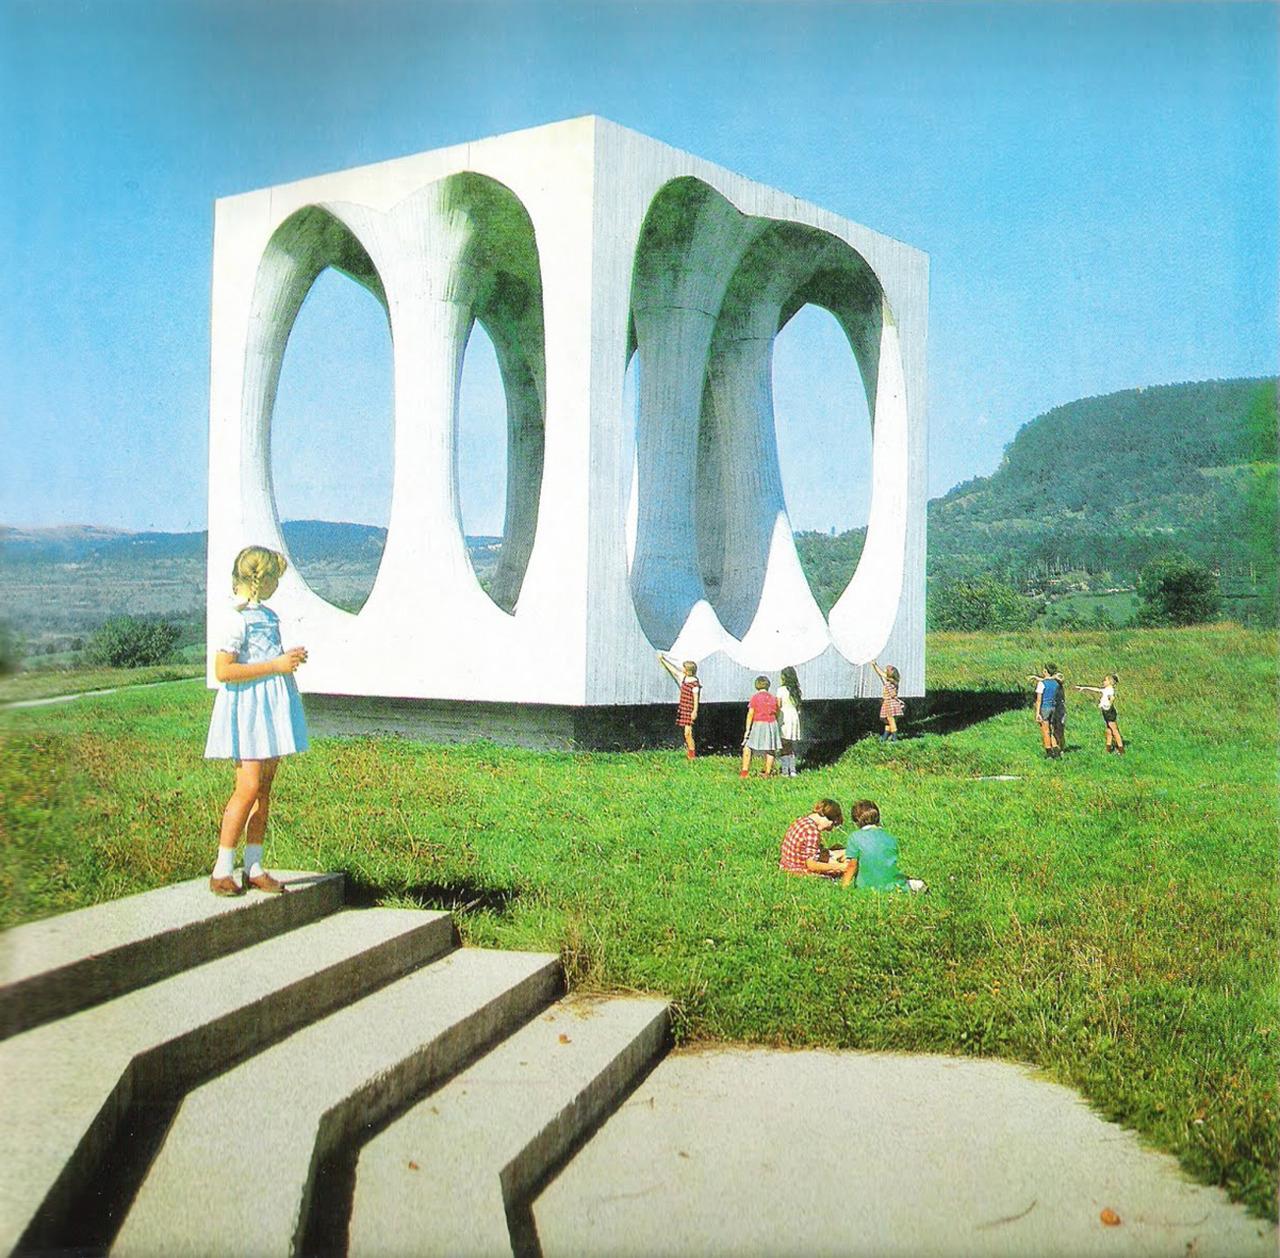 DOUGLASCAIN: Soviet Modernism